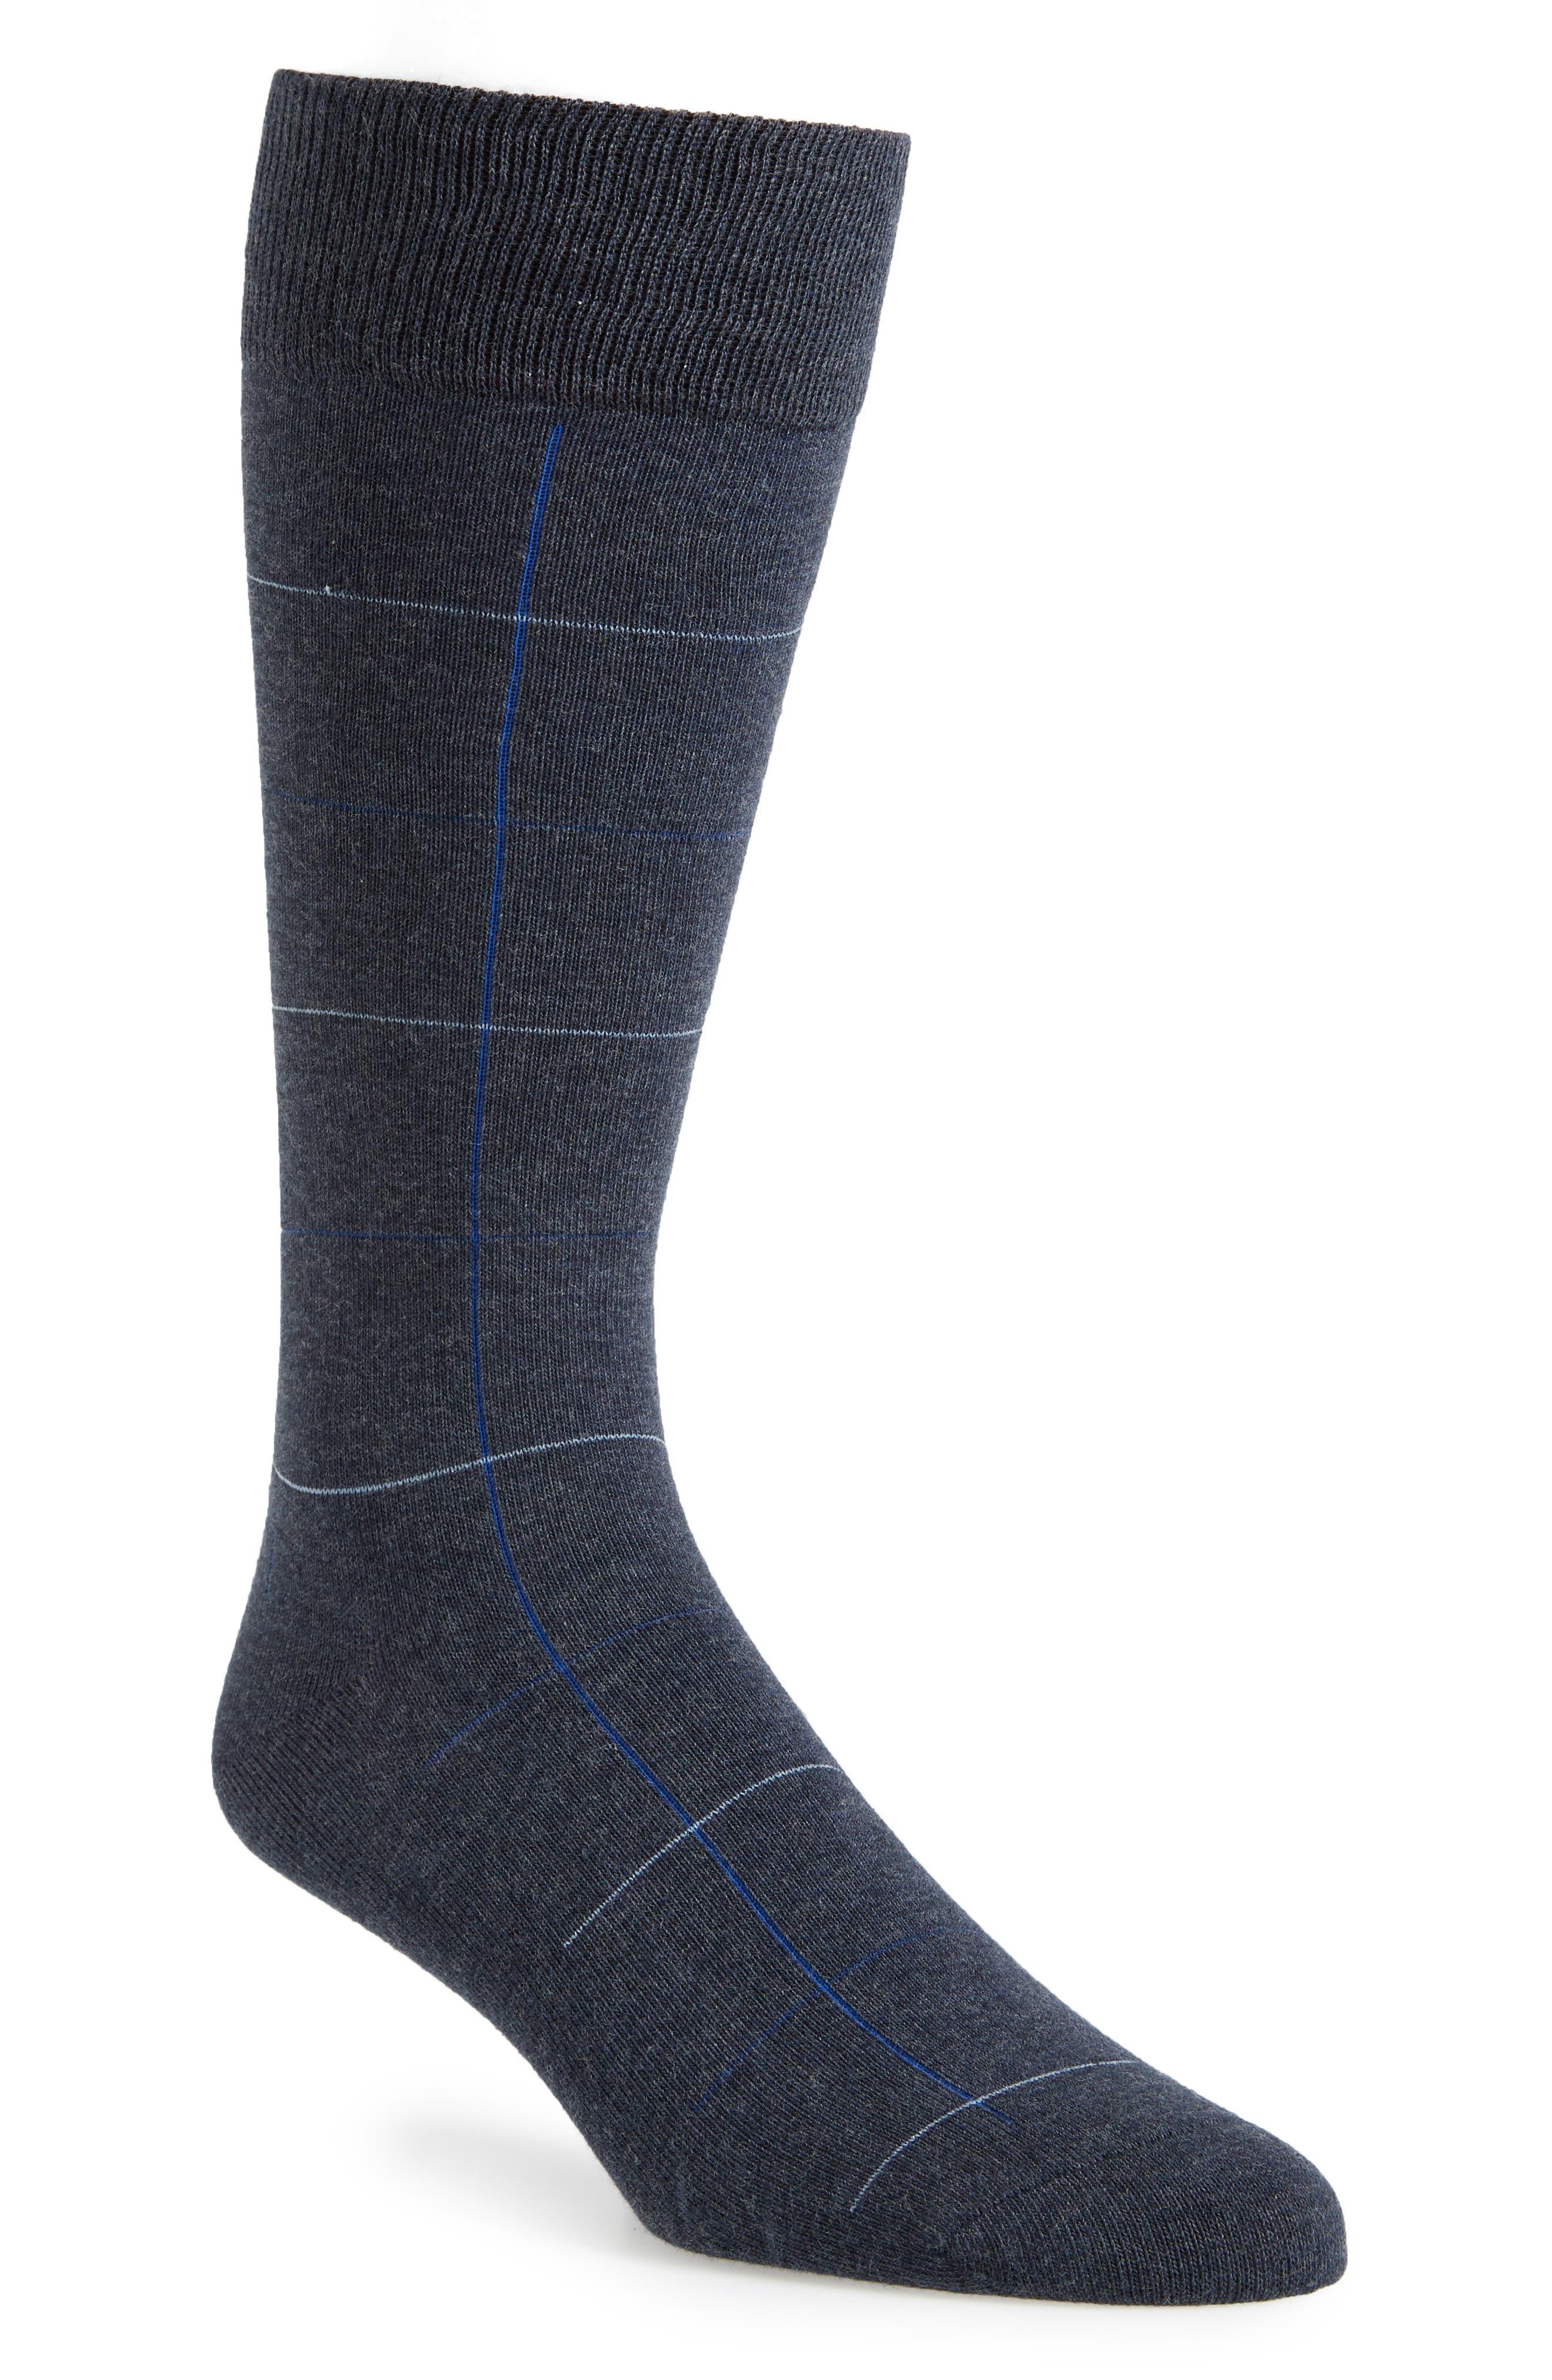 Calibrate Check Socks